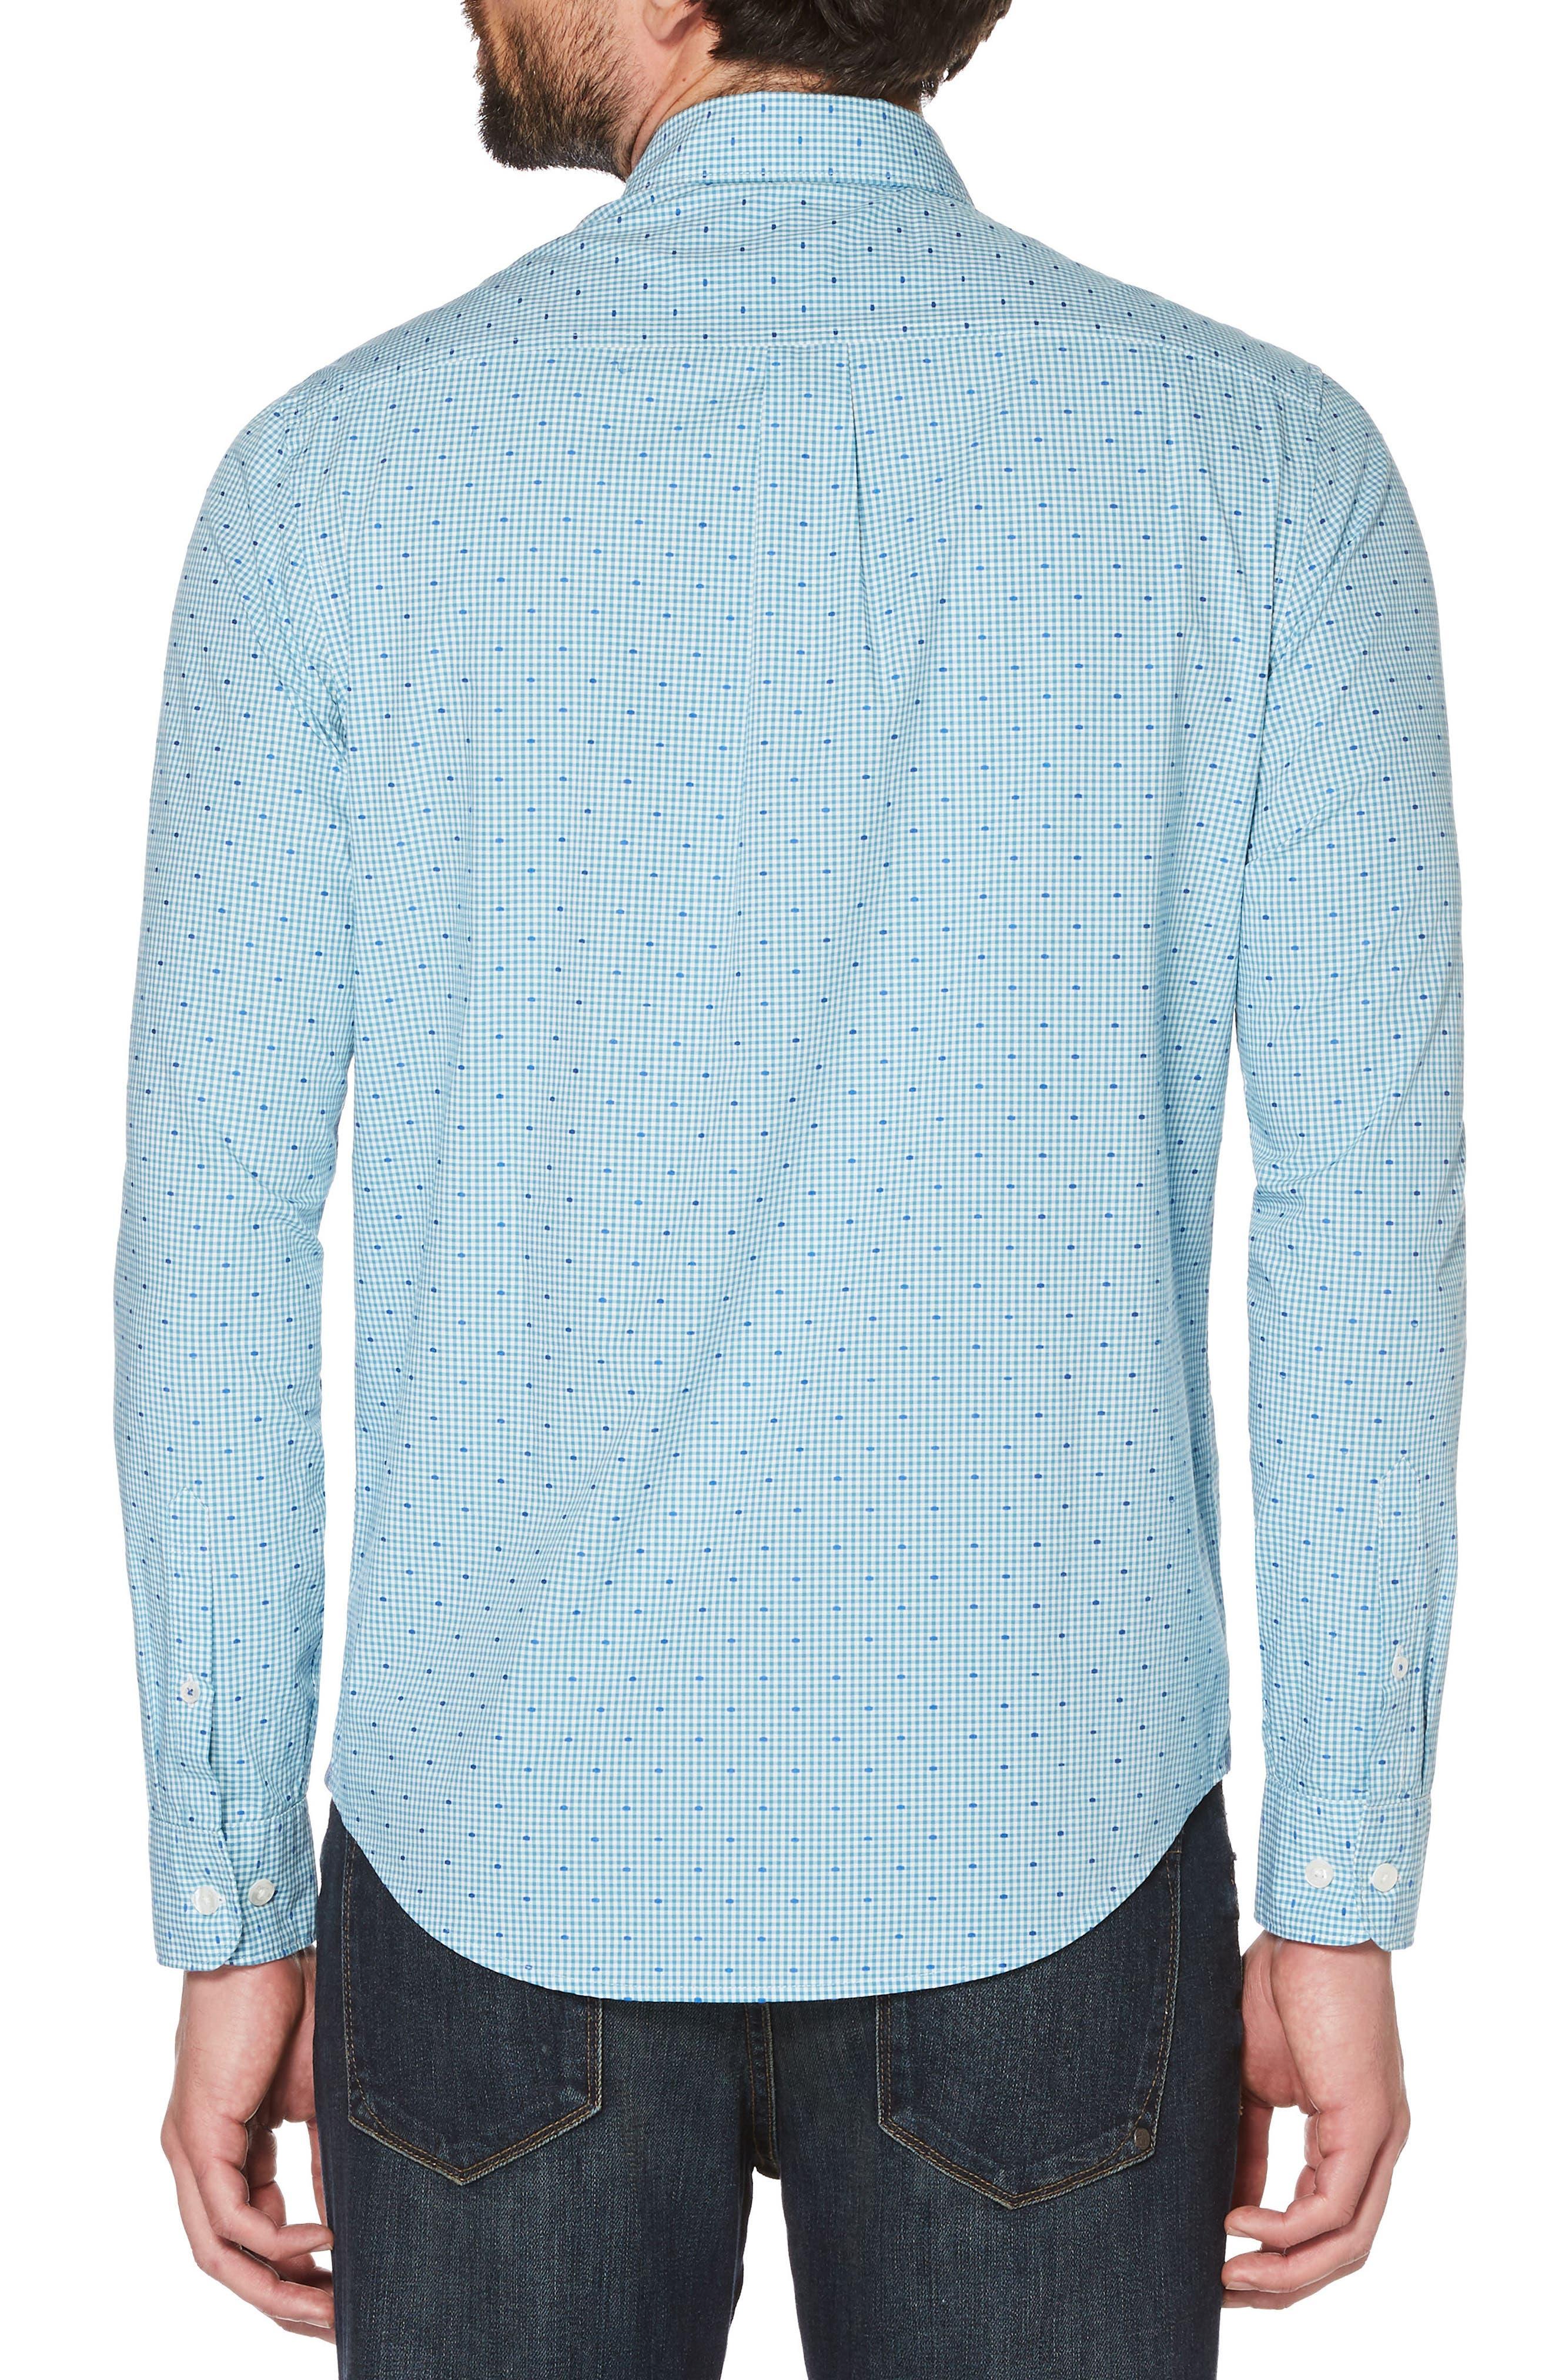 Dobby Shirt,                             Alternate thumbnail 2, color,                             Blue Moon